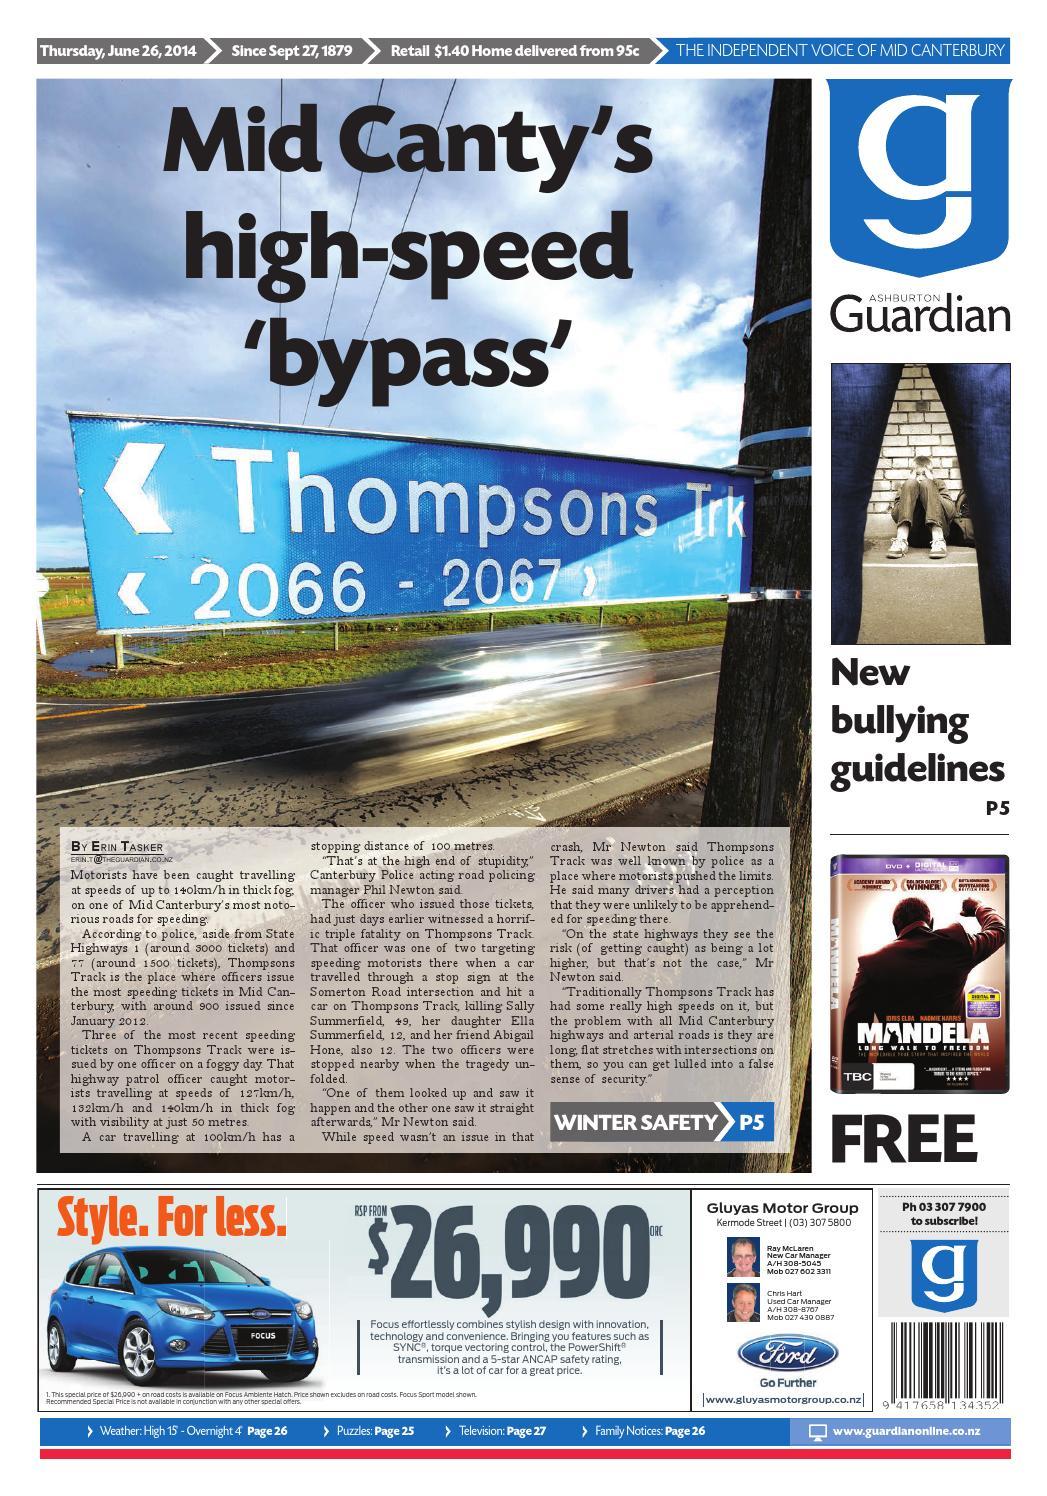 Ag 26 june, 2014 by Ashburton Guardian - issuu